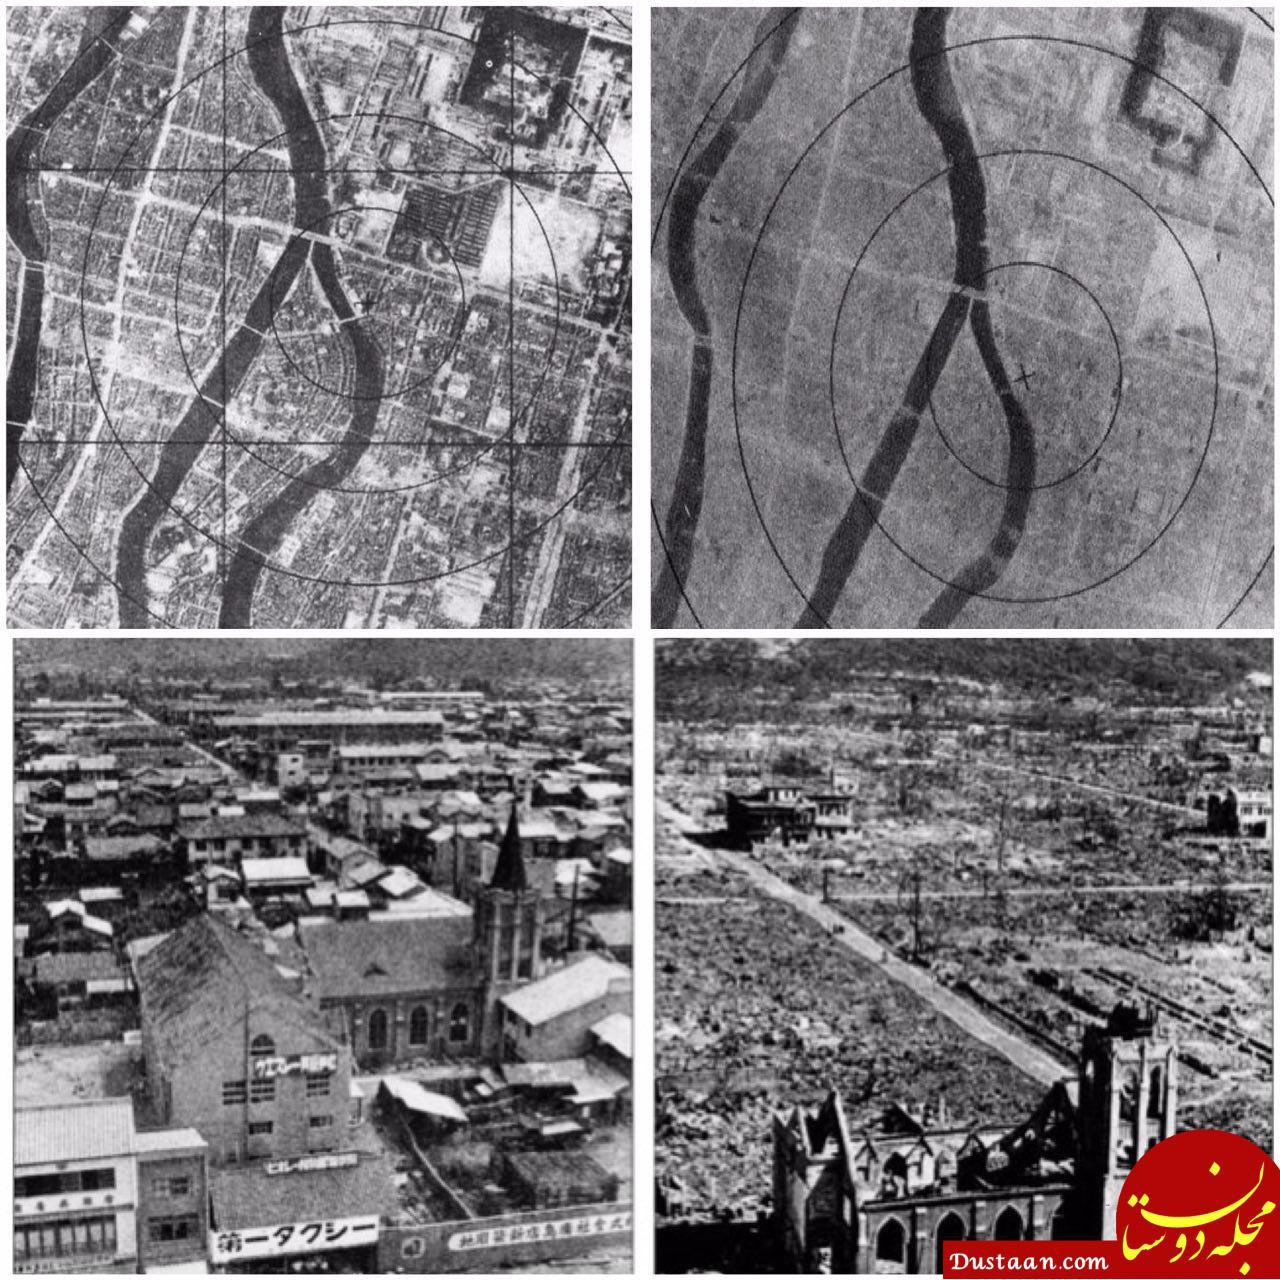 www.dustaan.com تصاویر هوایی و زمینى از هیروشیما قبل و بعد از بمباران اتمی